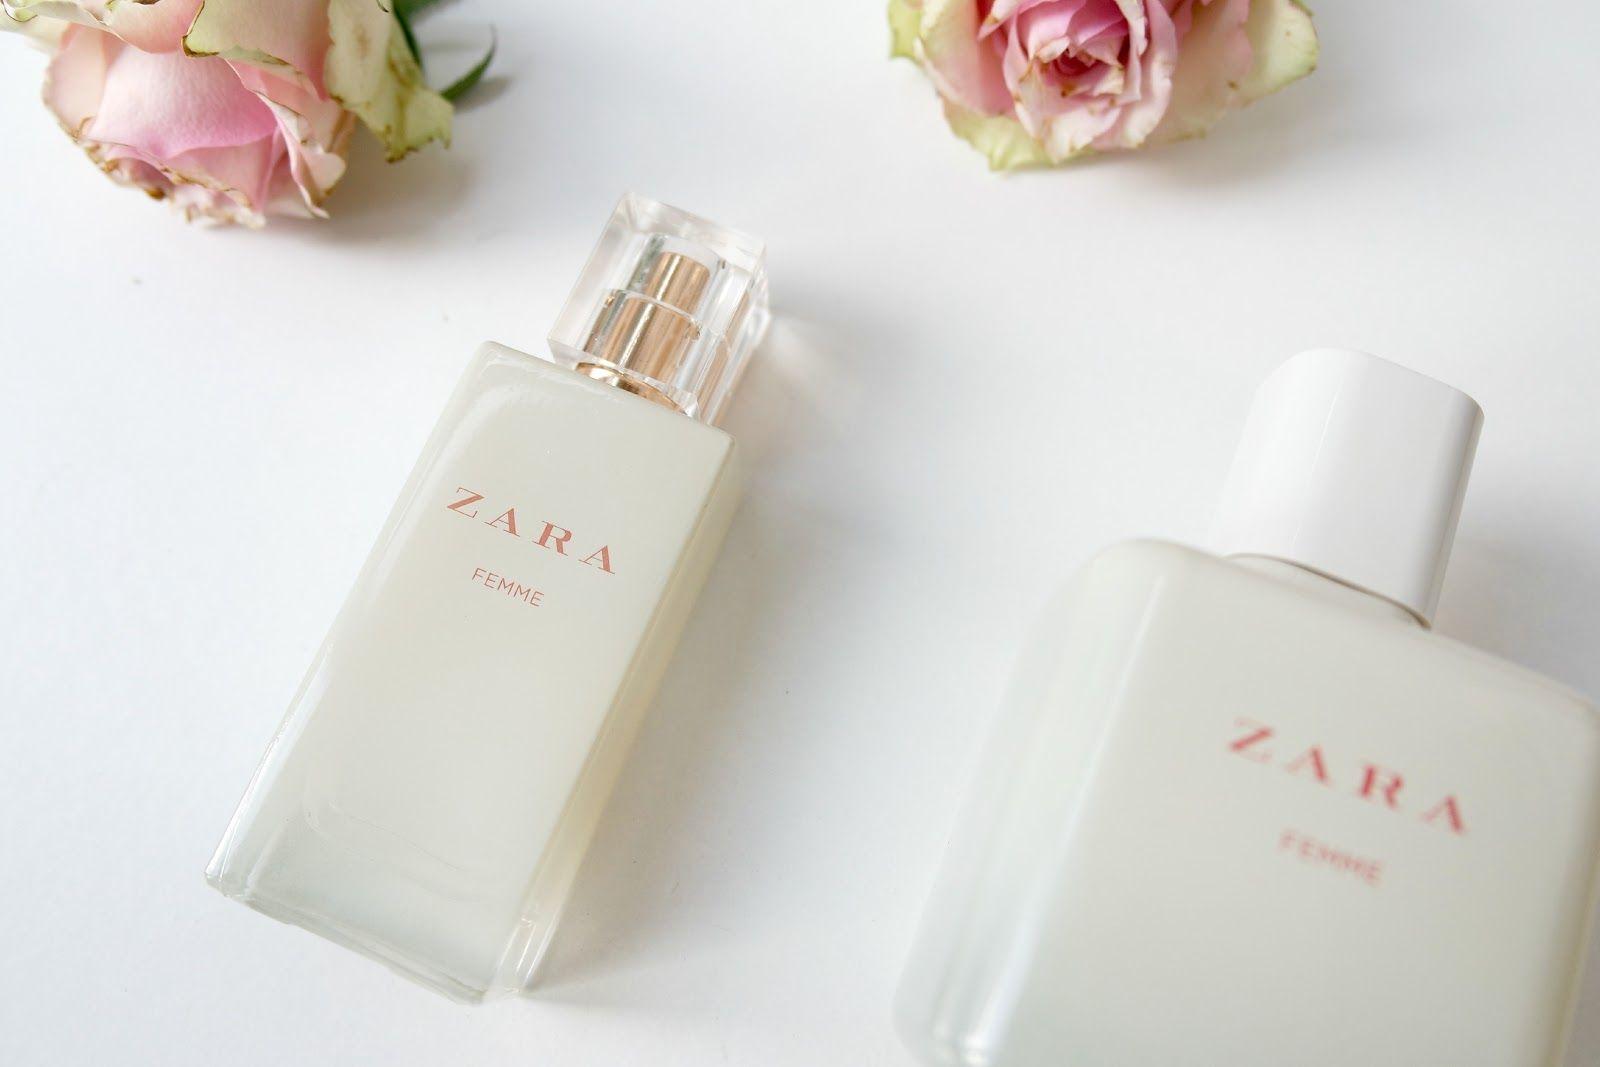 Pin On My Favorite Perfume